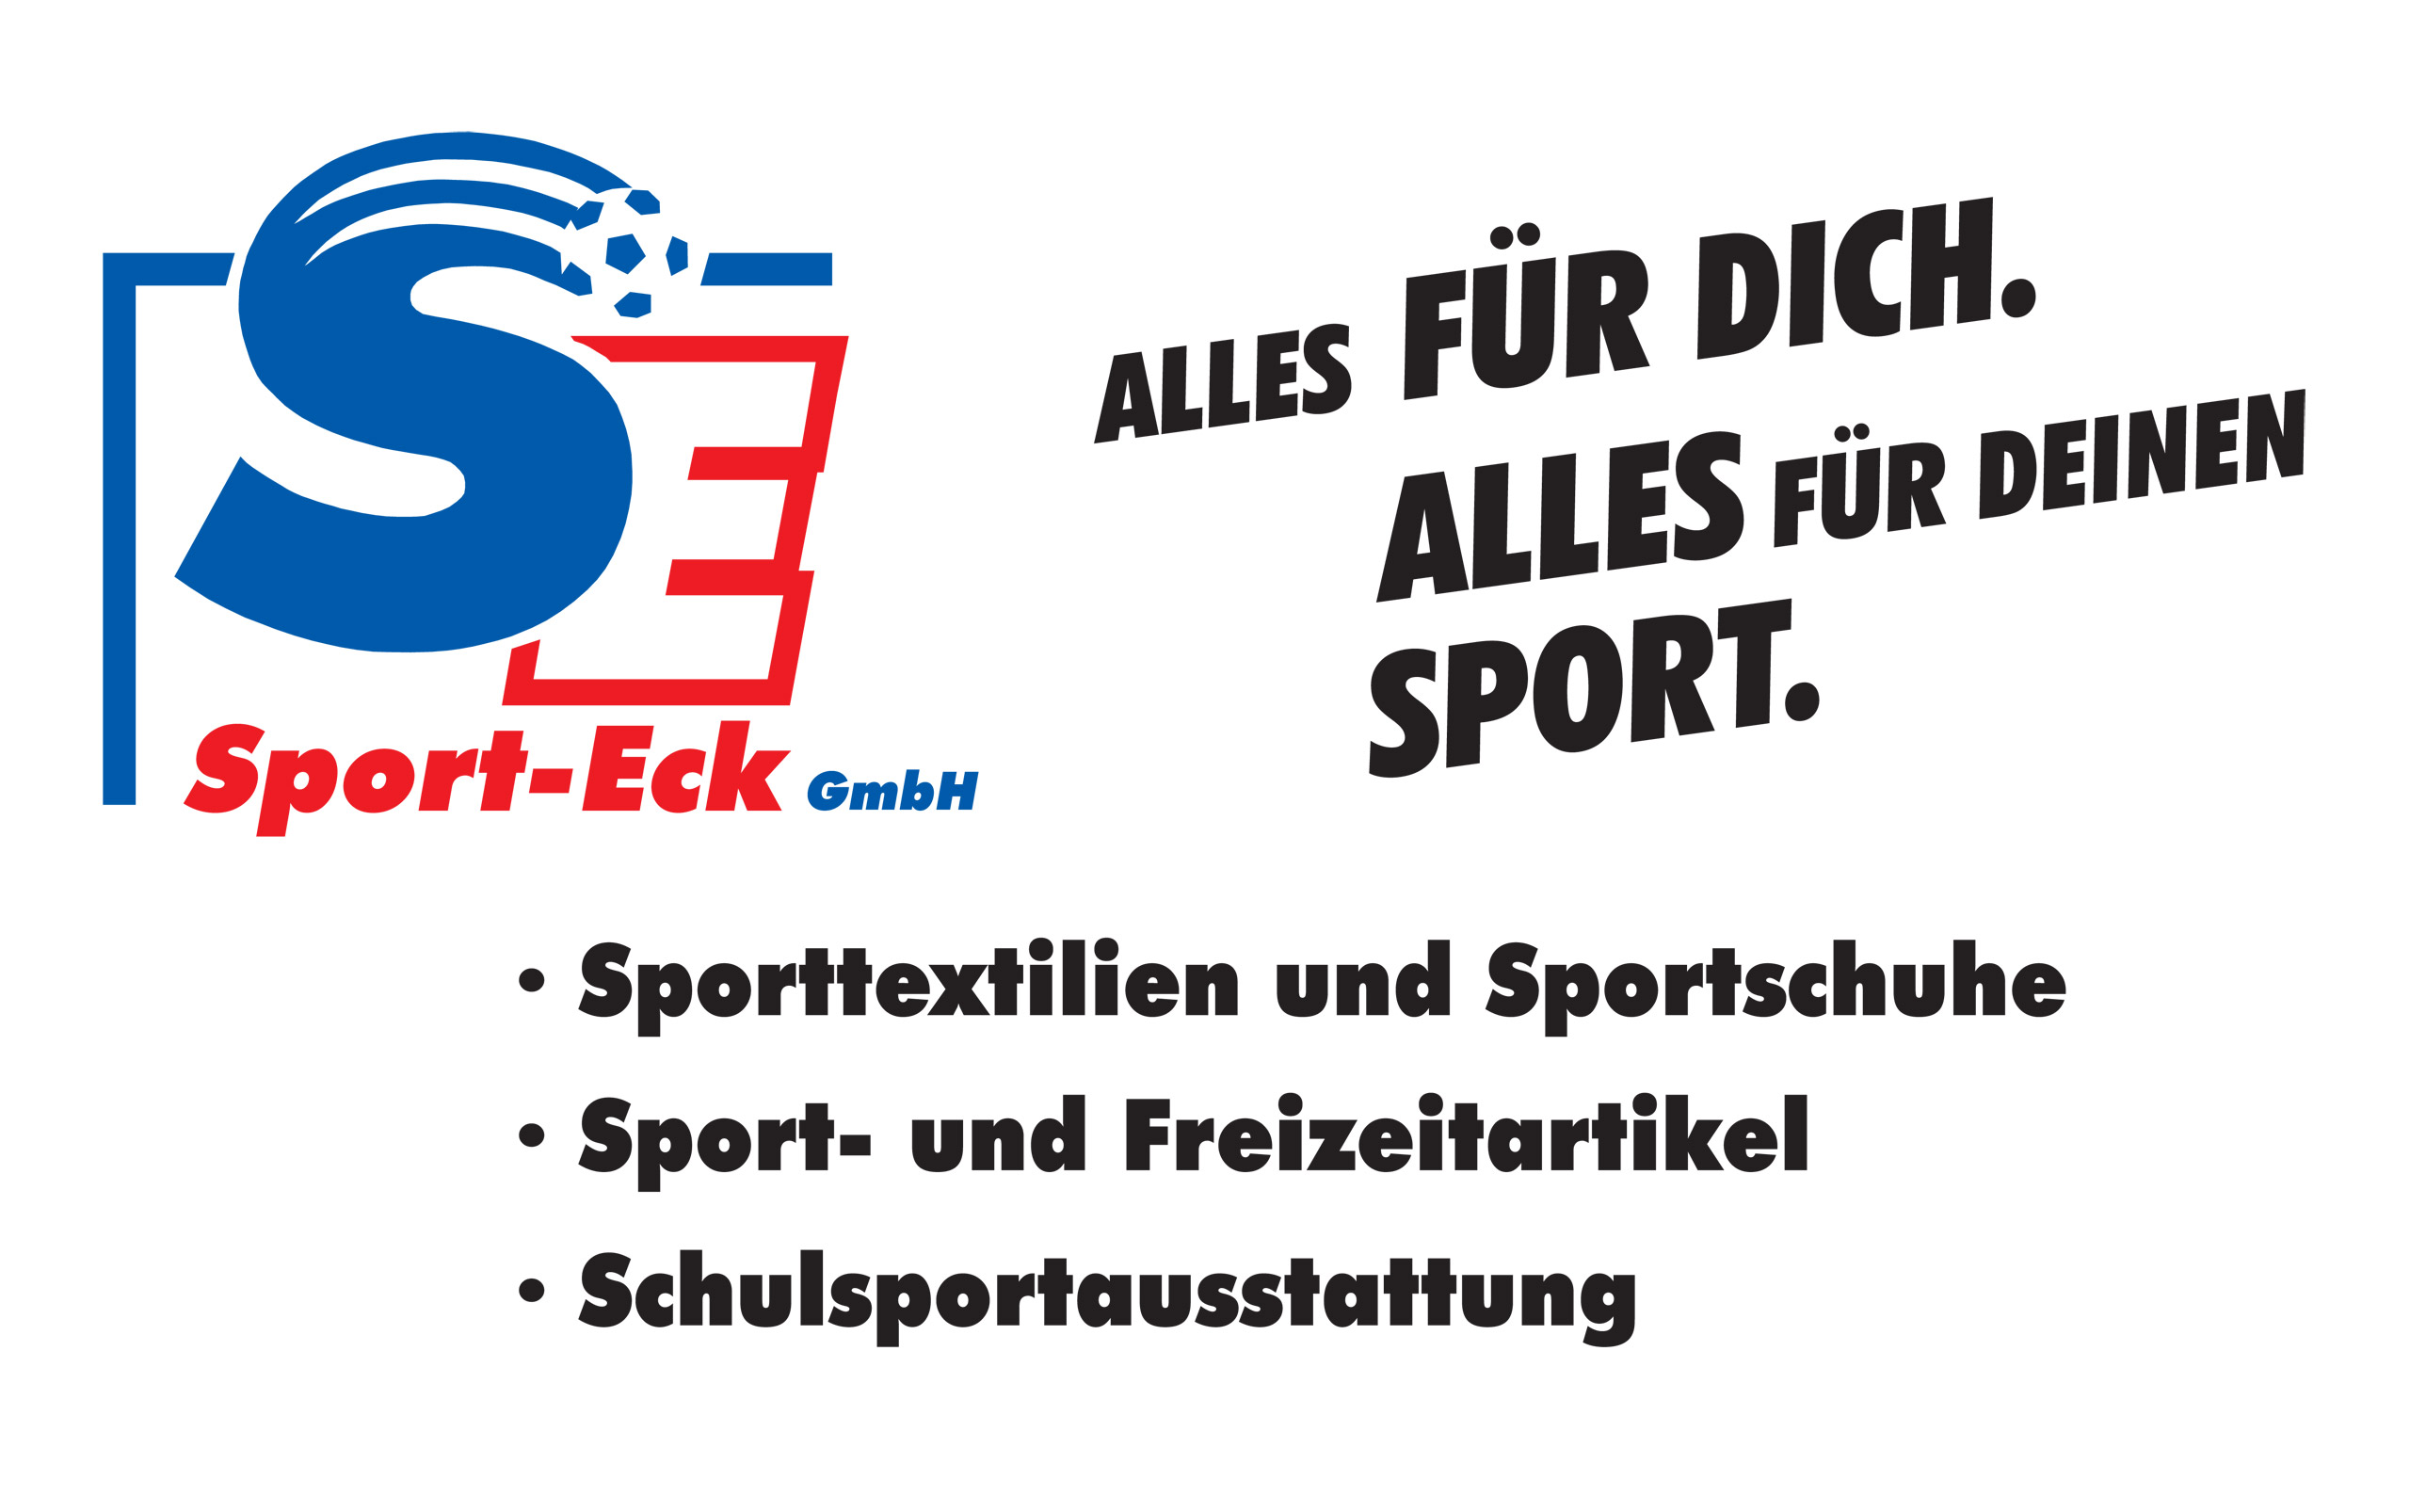 Sporteck_Bild1